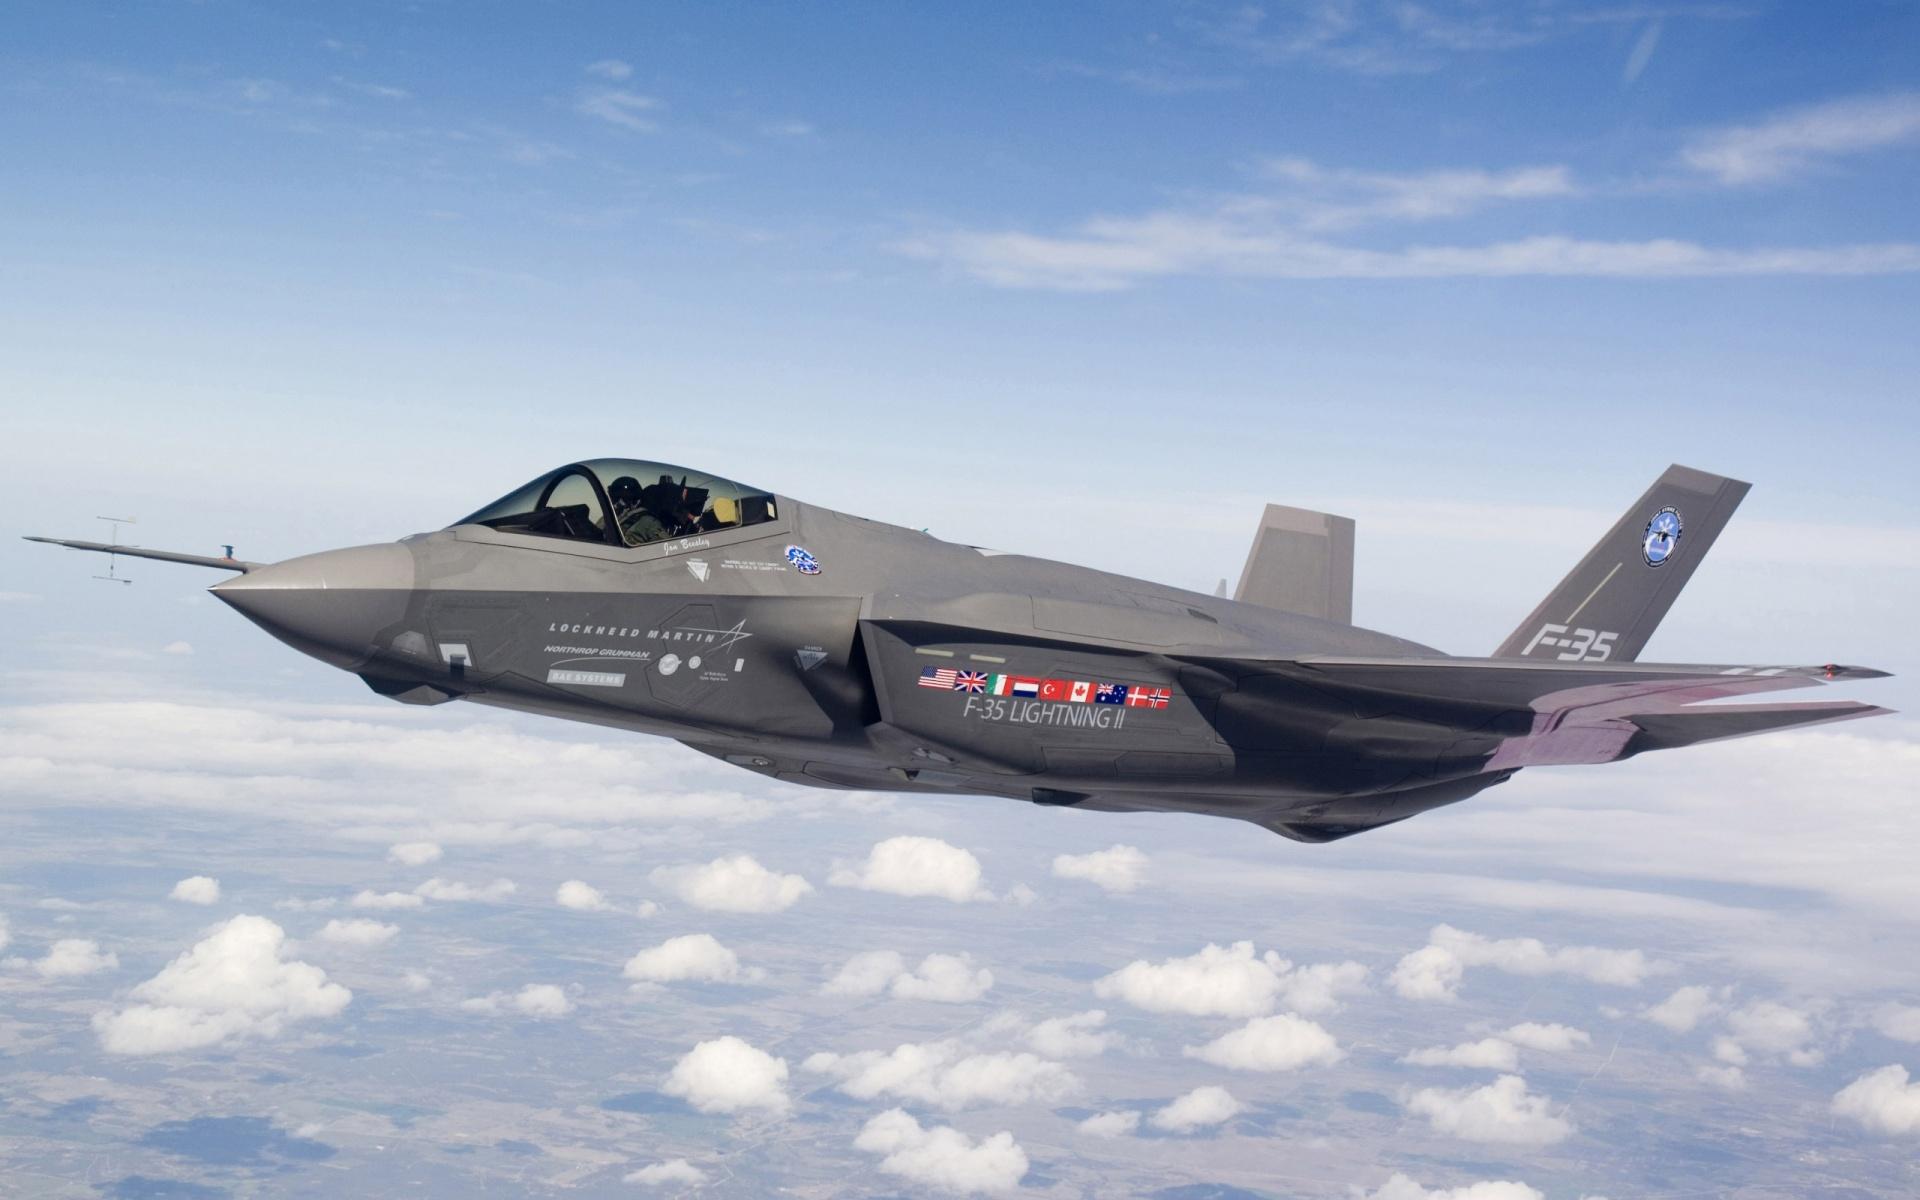 F-35: l'evoluzione dei jet è sospesa causa tagli al budget